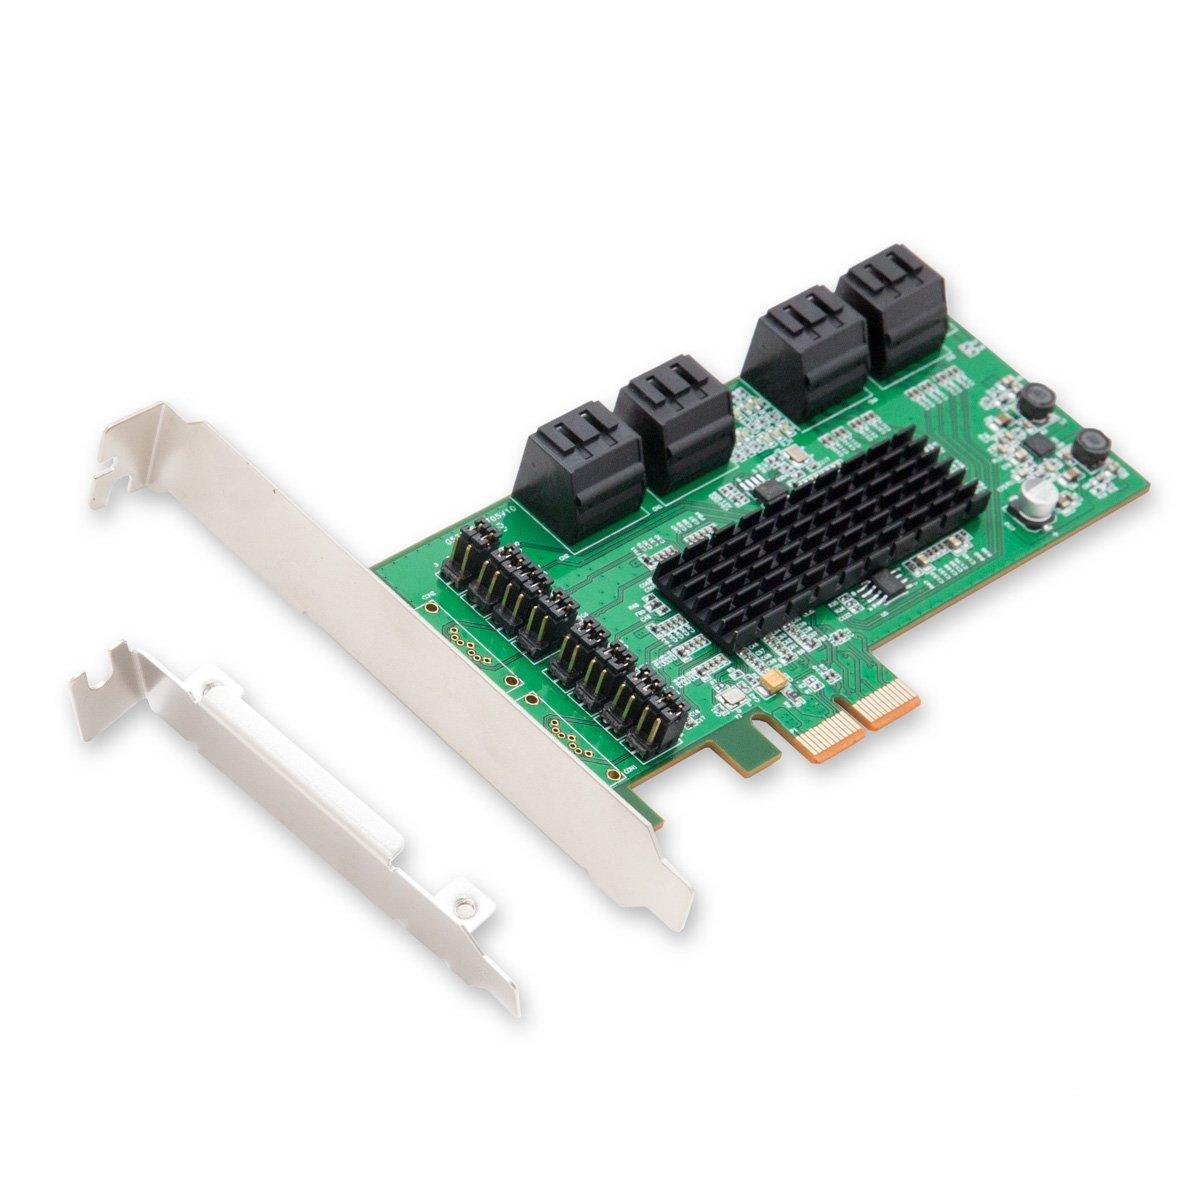 SYBA SI-PEX40071 Eingebaut SATA Schnittstellenkarte/Adapter